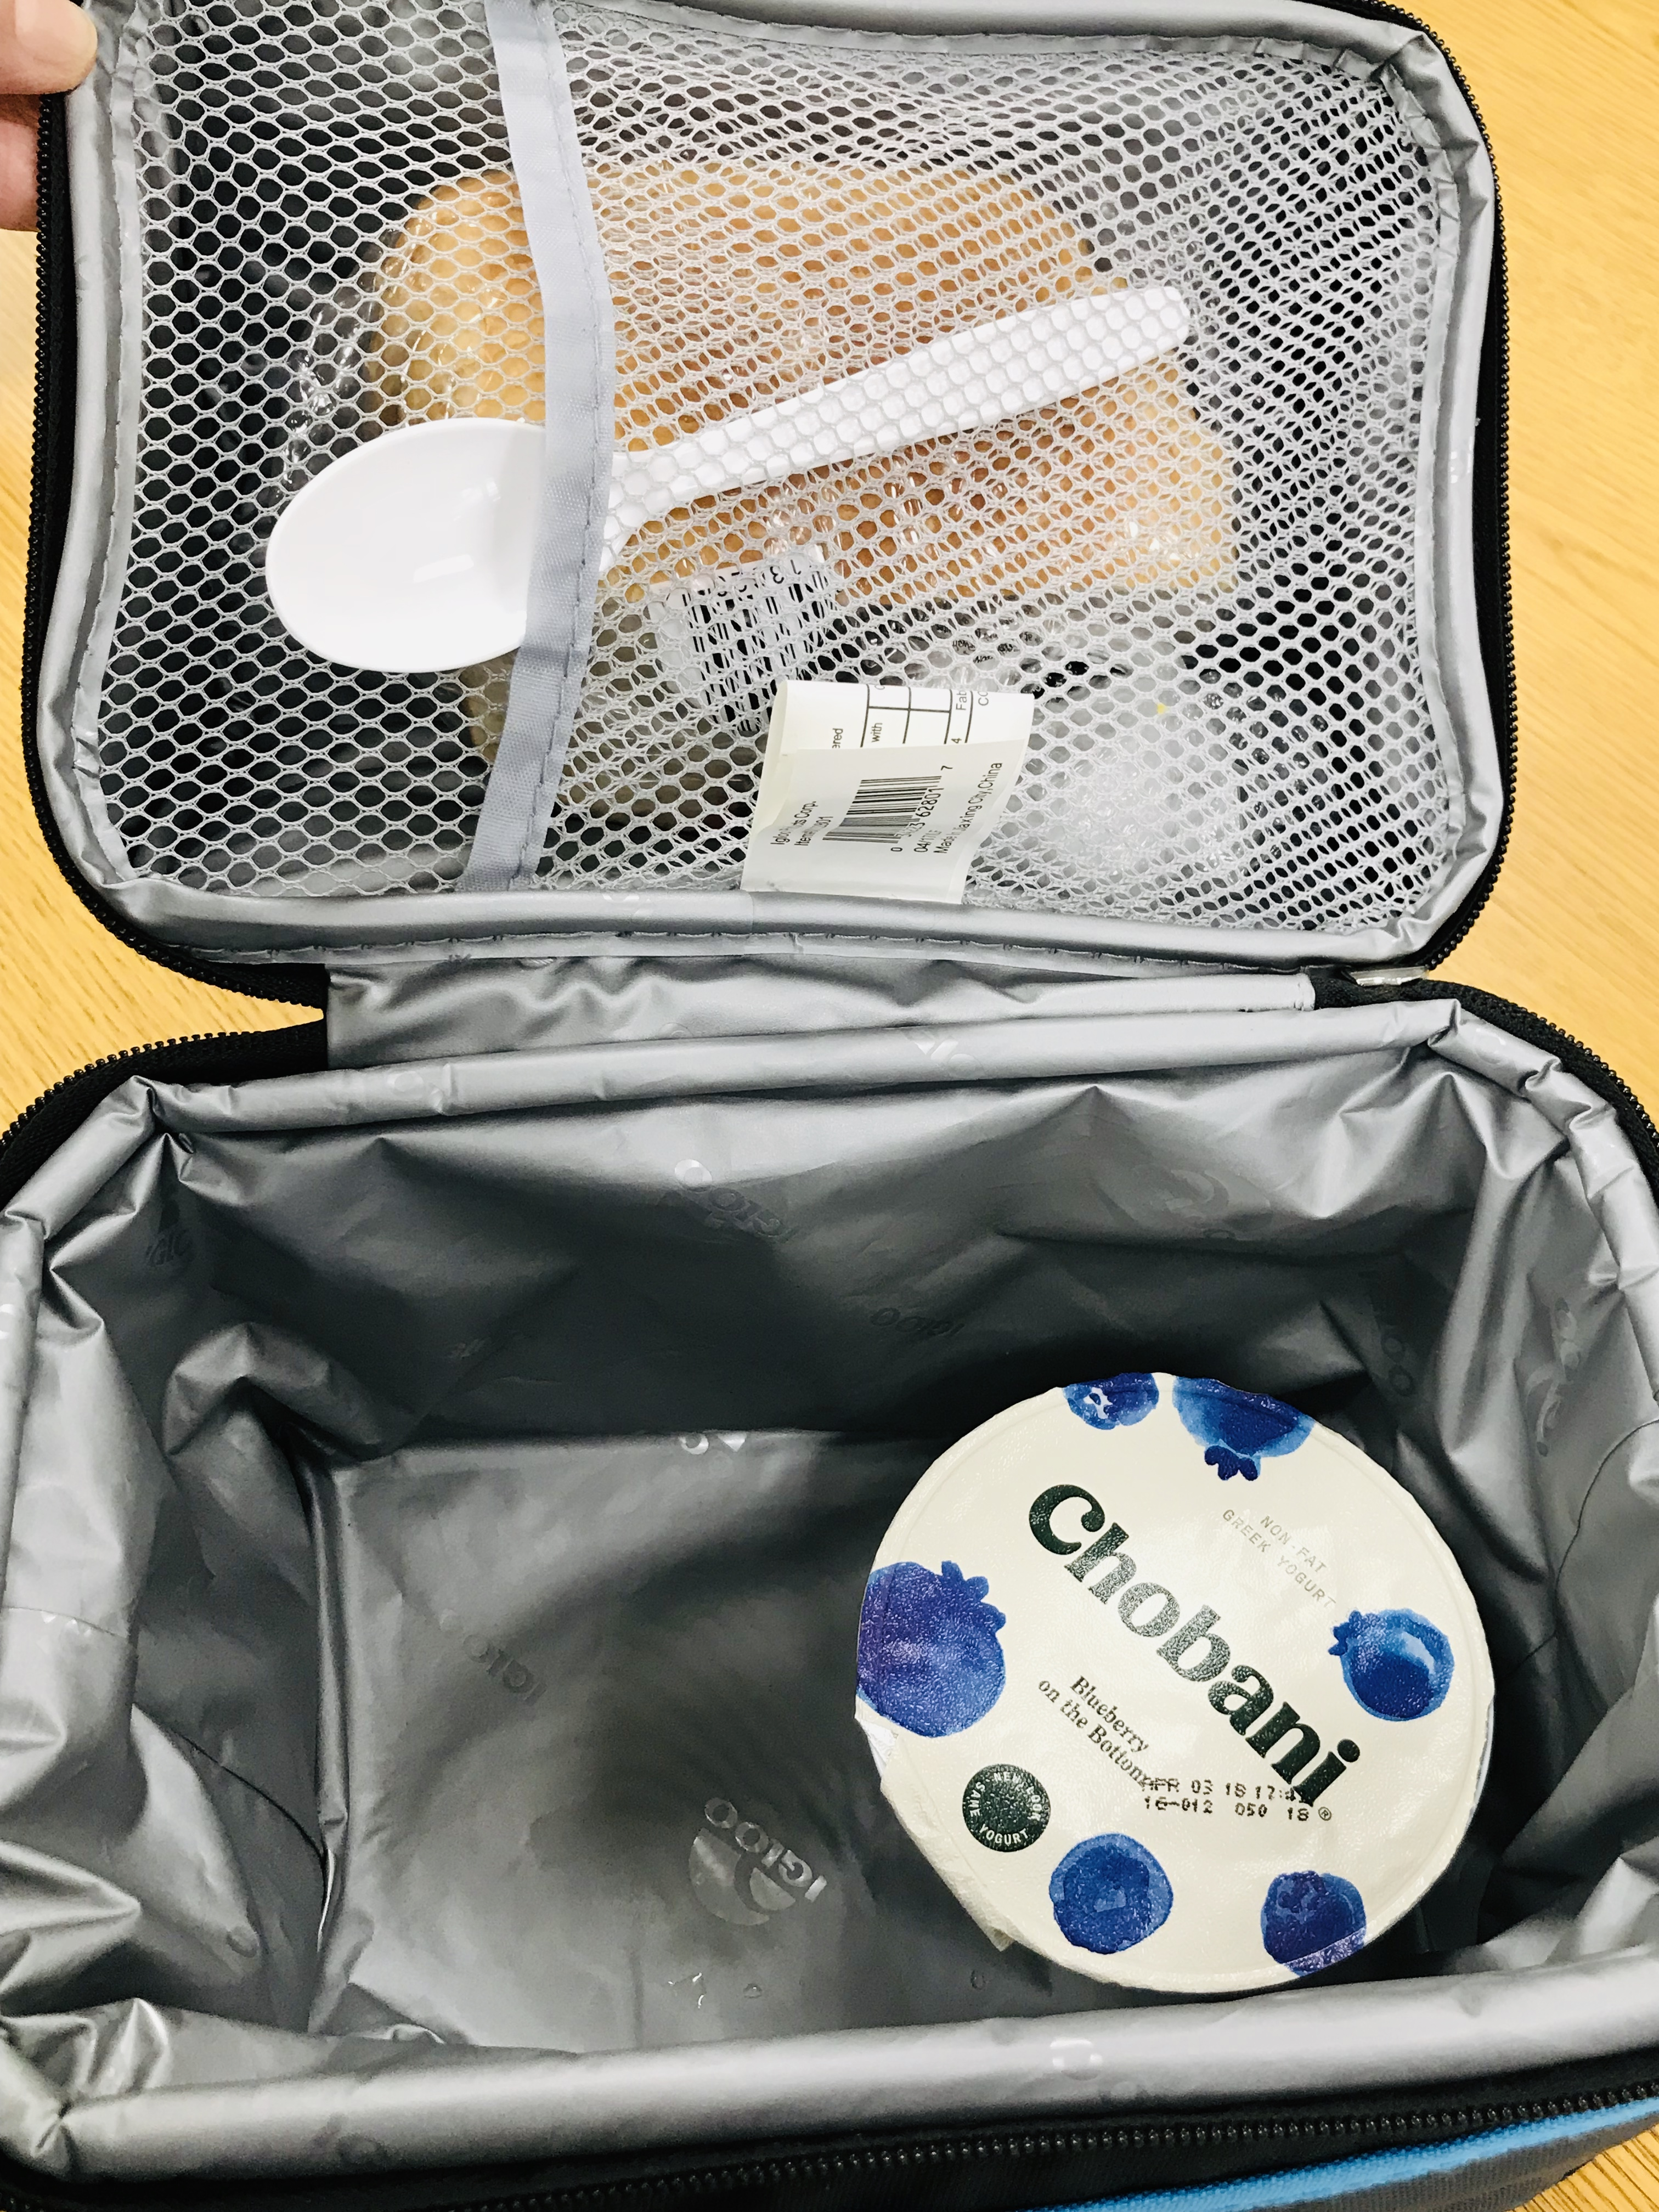 Lunchbox with sandwich and yogurt